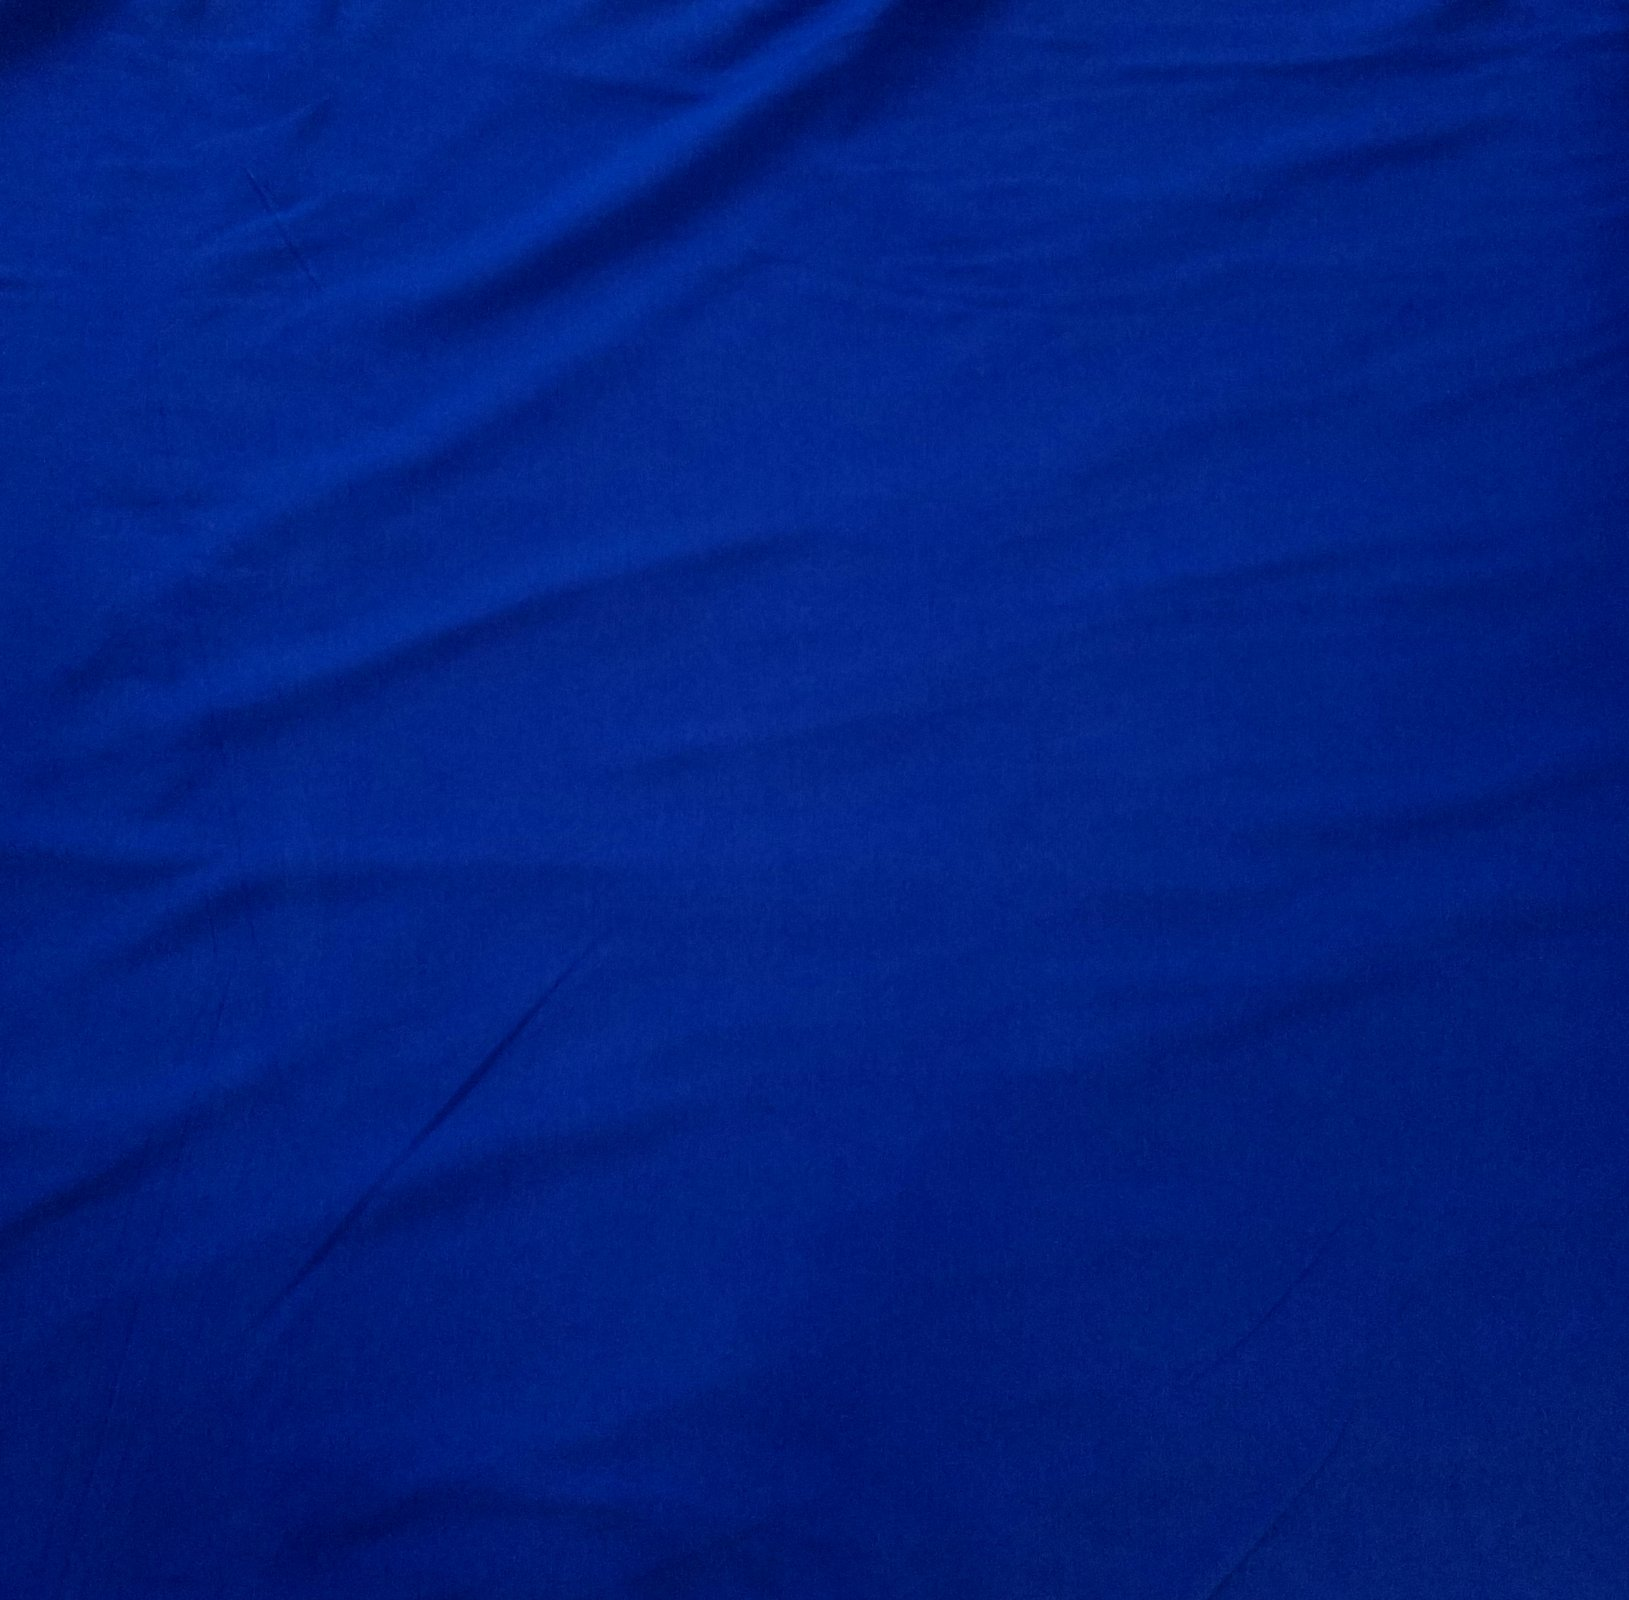 Jazz Blue Cotton/Spandex Knit